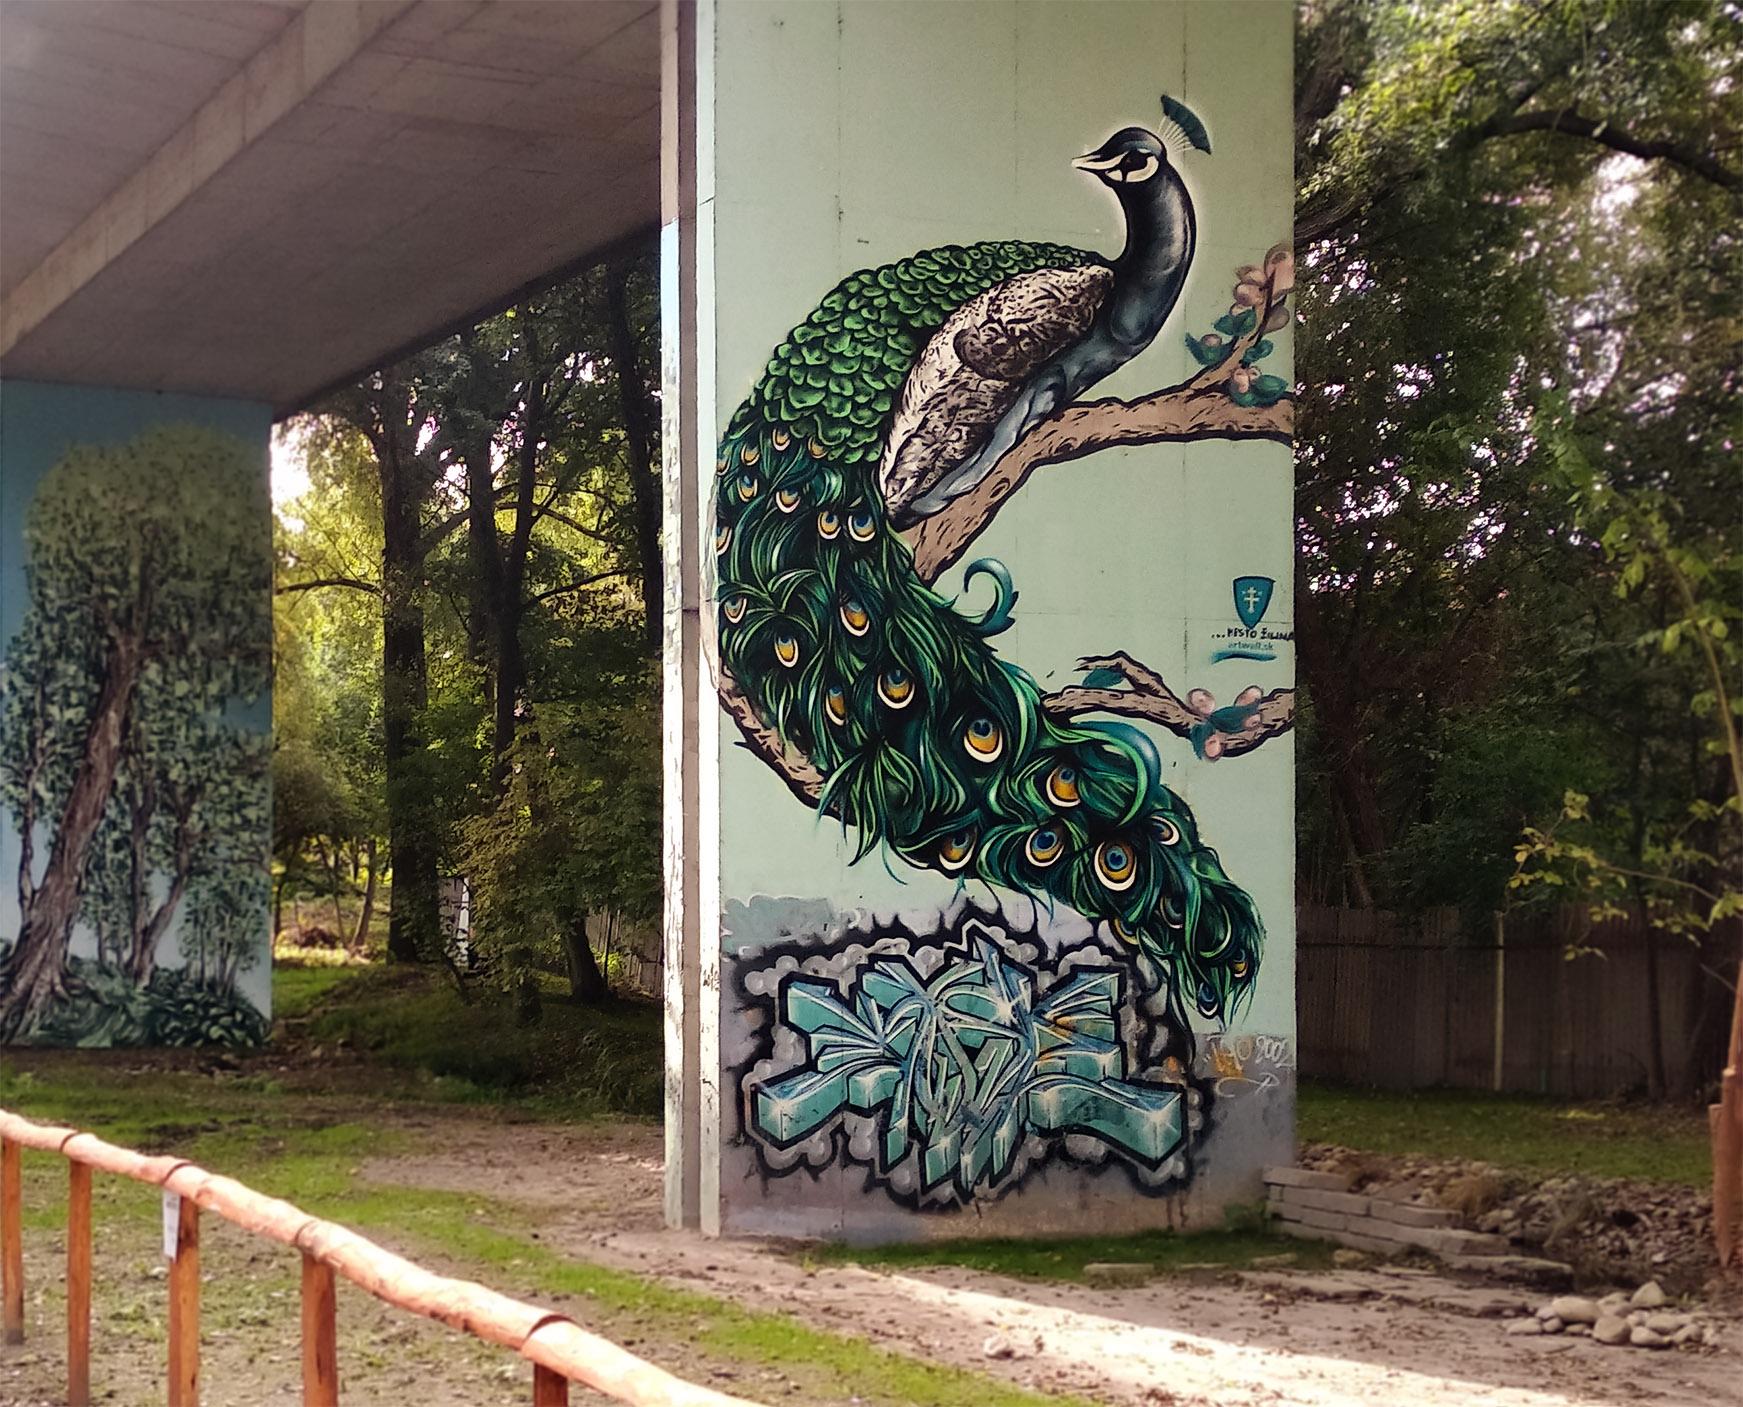 Peacock_street art